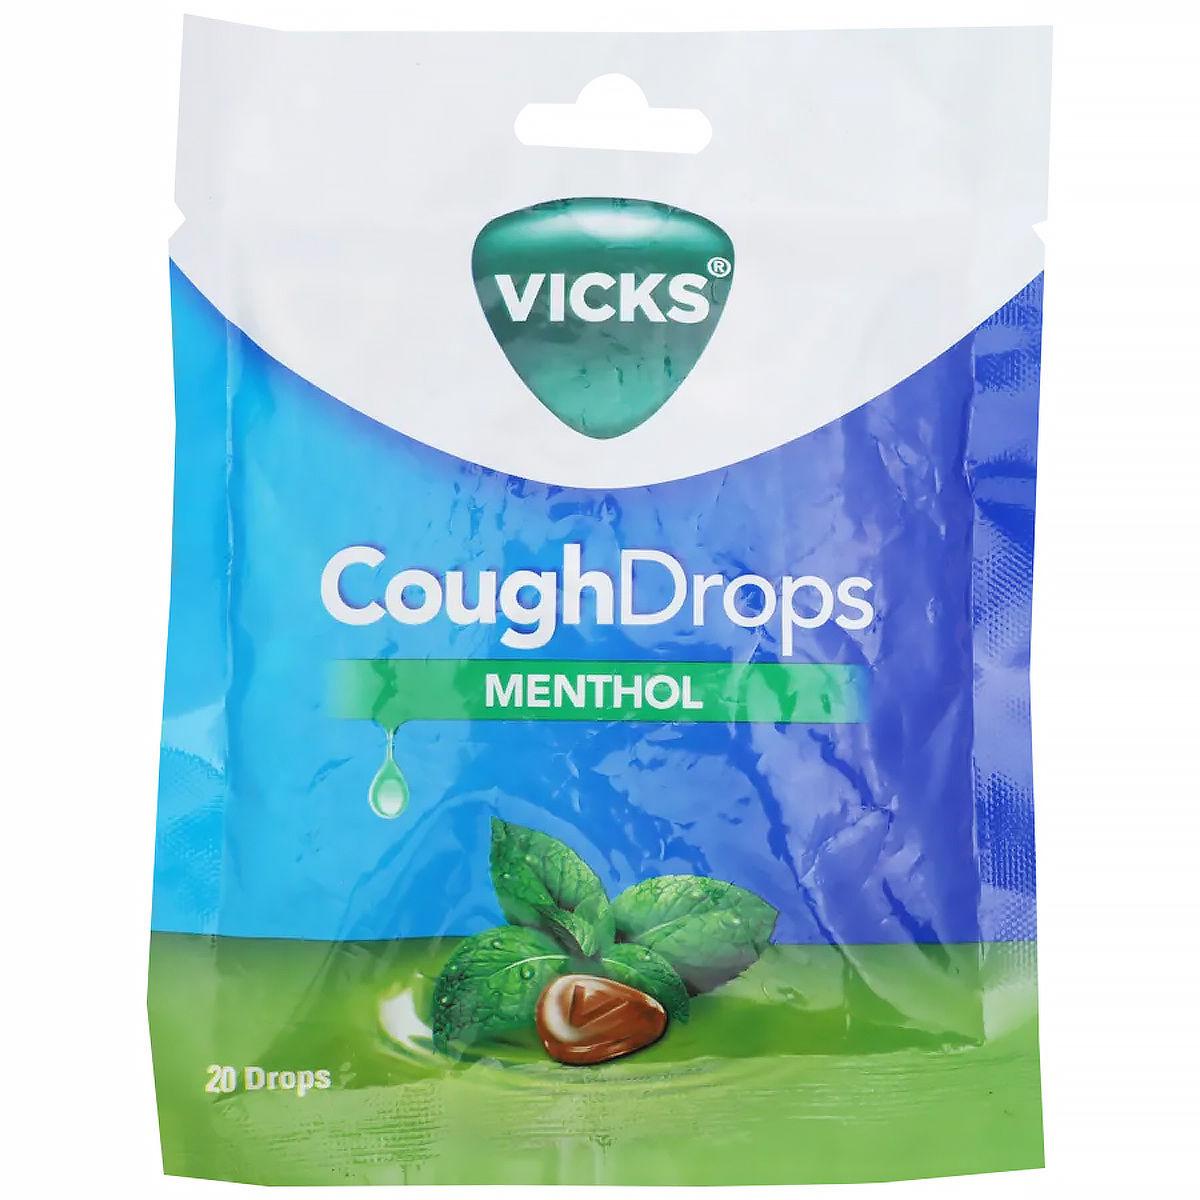 Vicks Menthol Cough Drops, 20 Count, Pack of 1